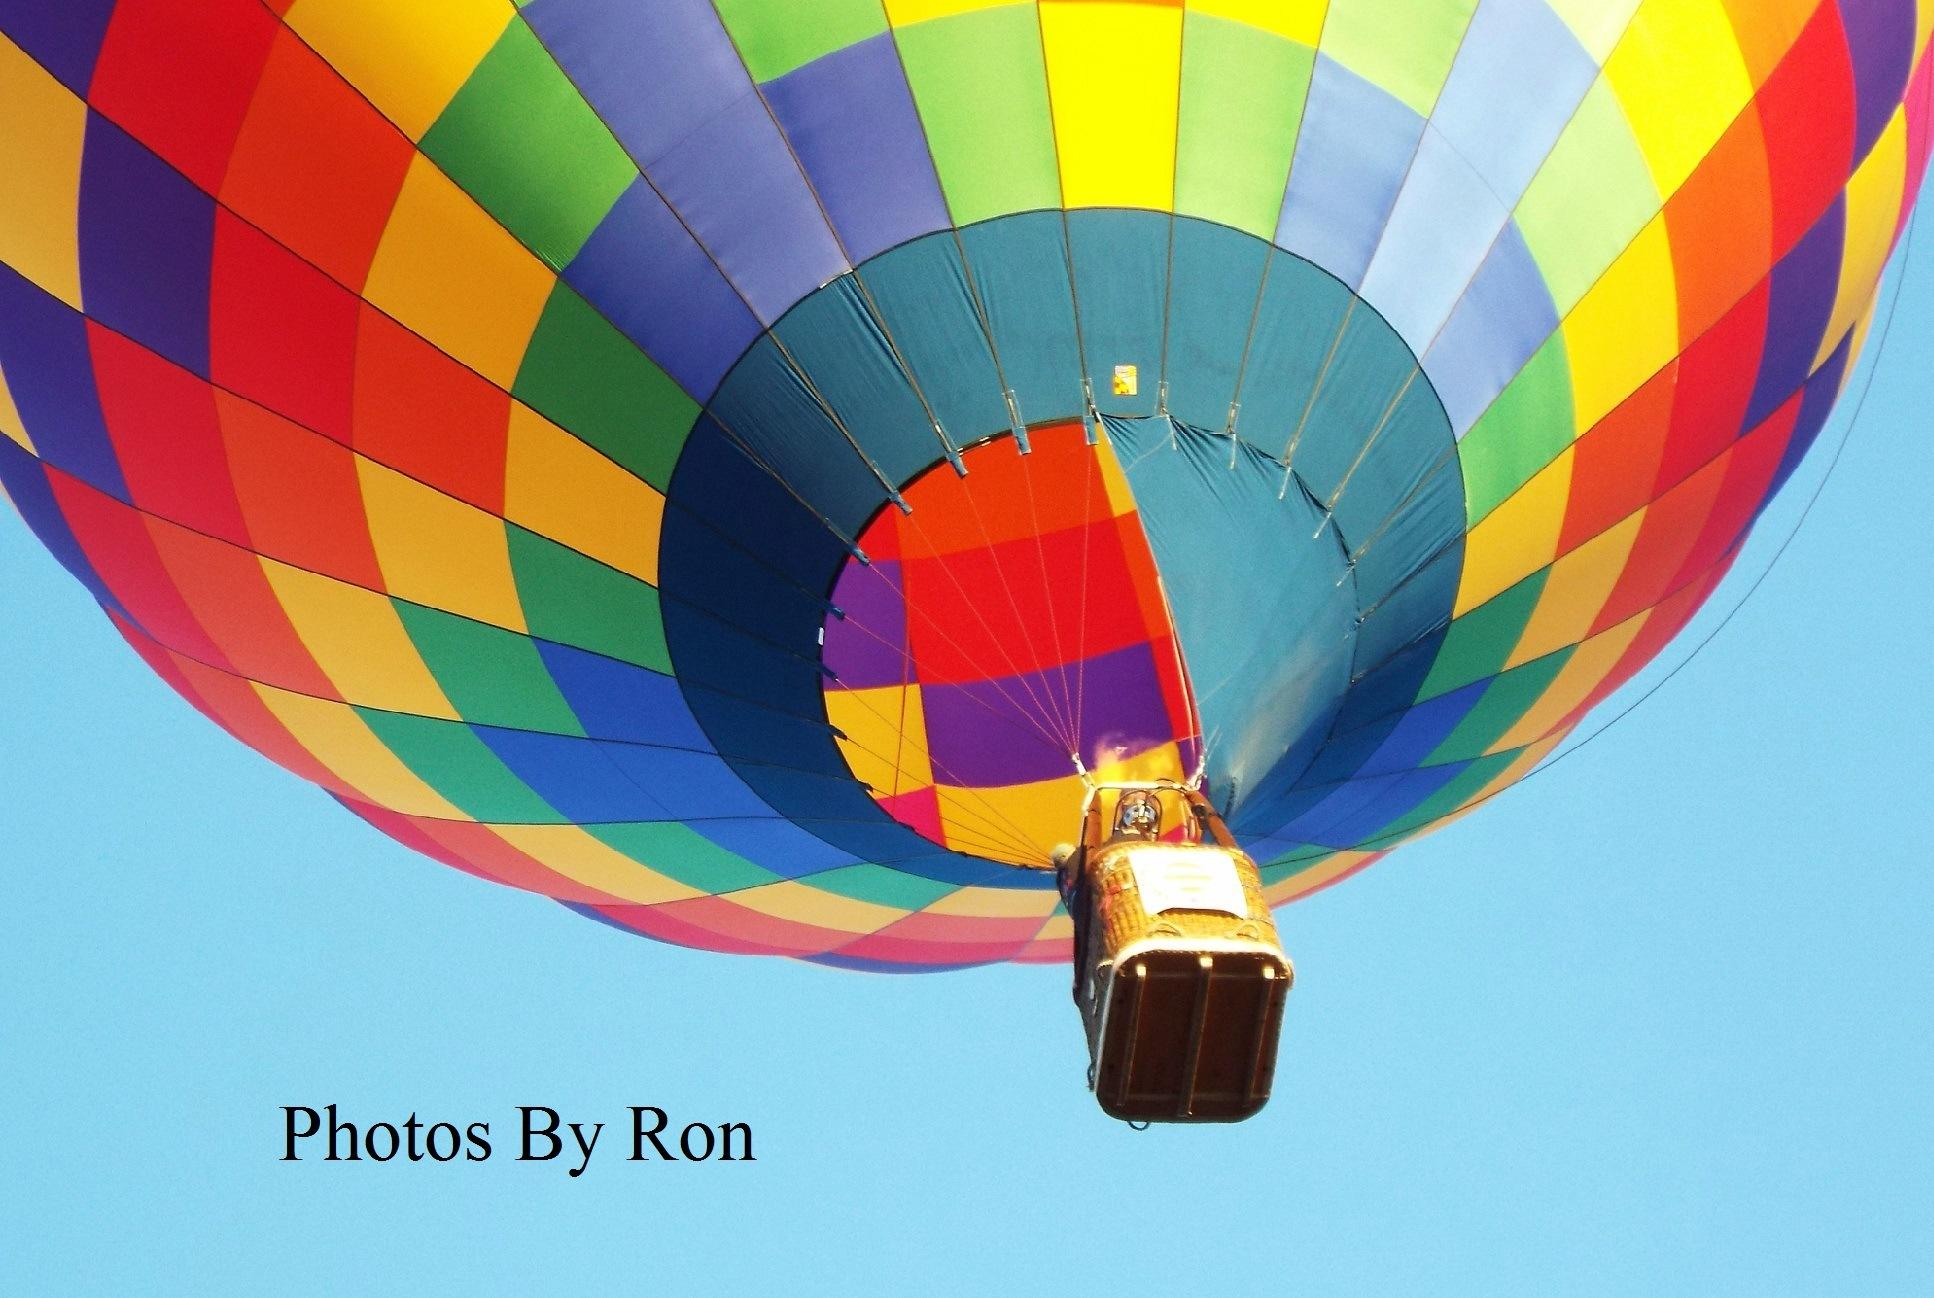 """Multi-Colored Hot Air Balloon"" by Ron Berkley"